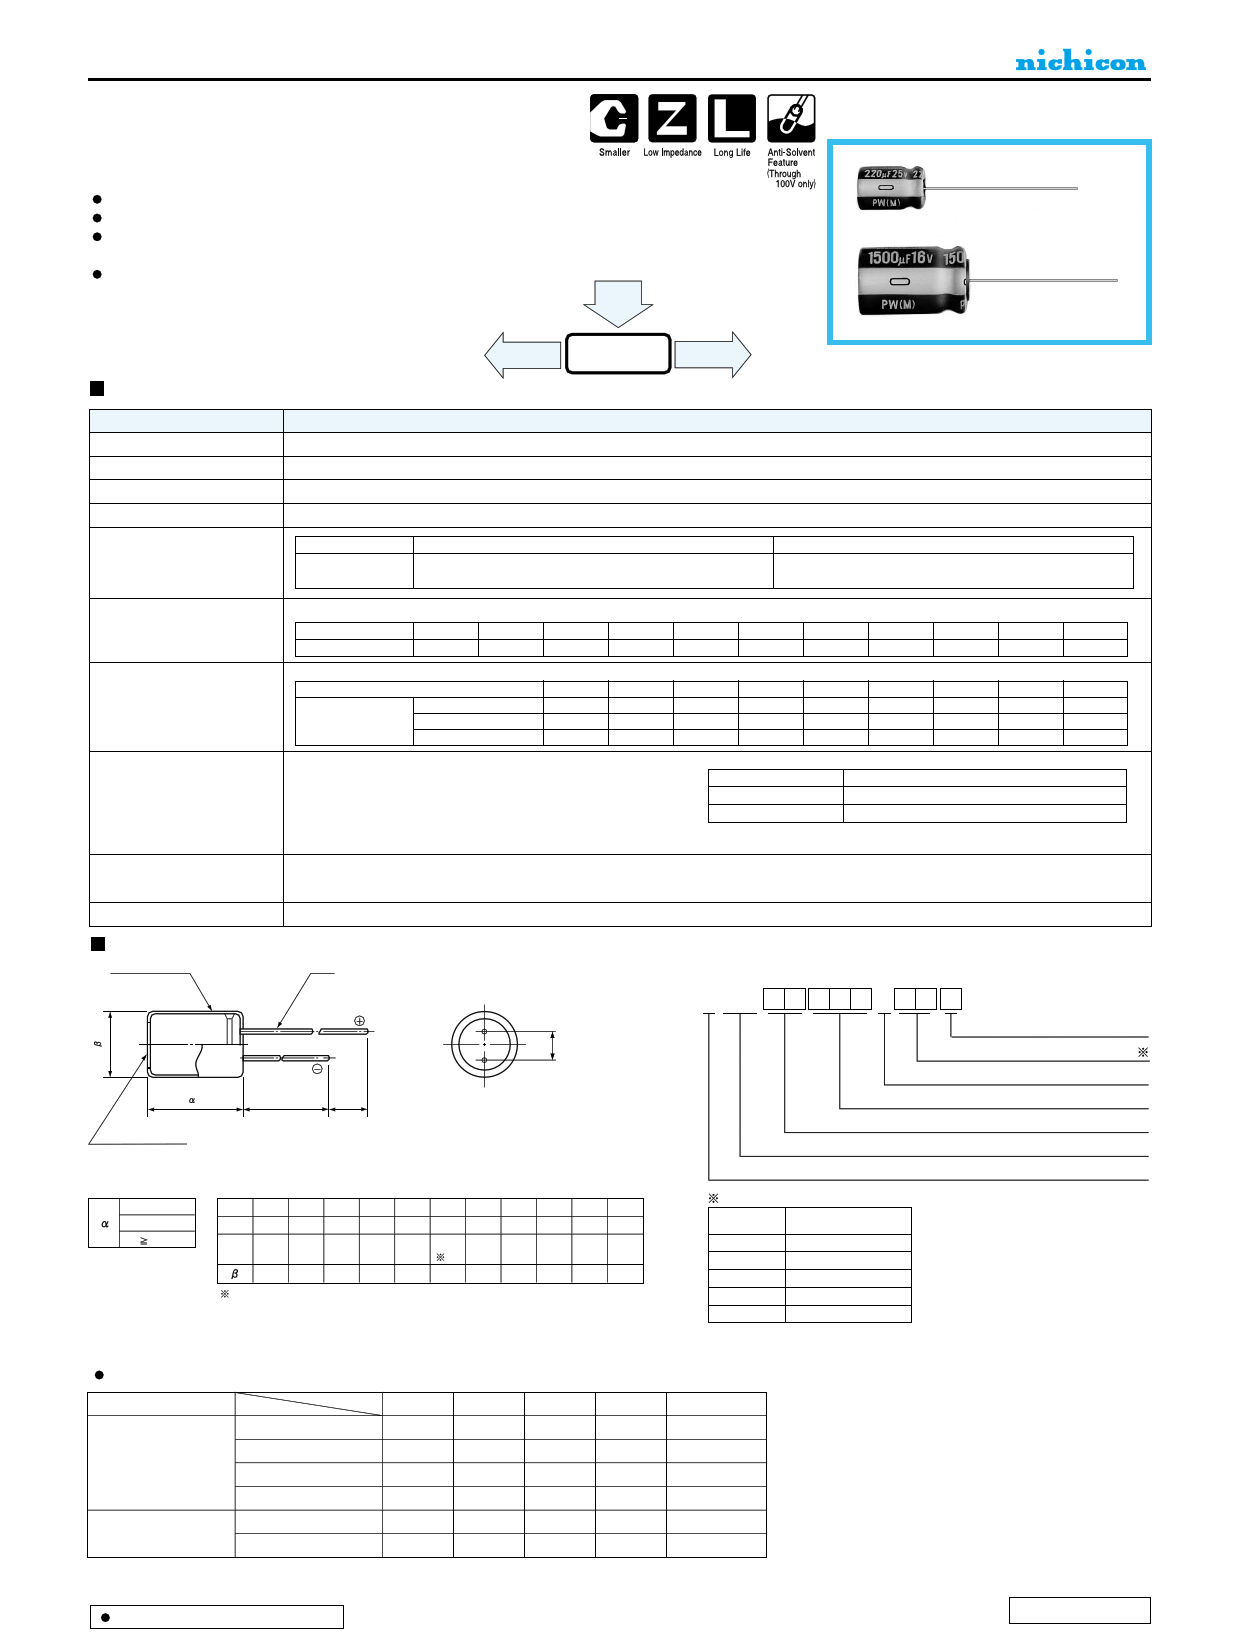 UPW1H330MED 데이터시트 및 UPW1H330MED PDF